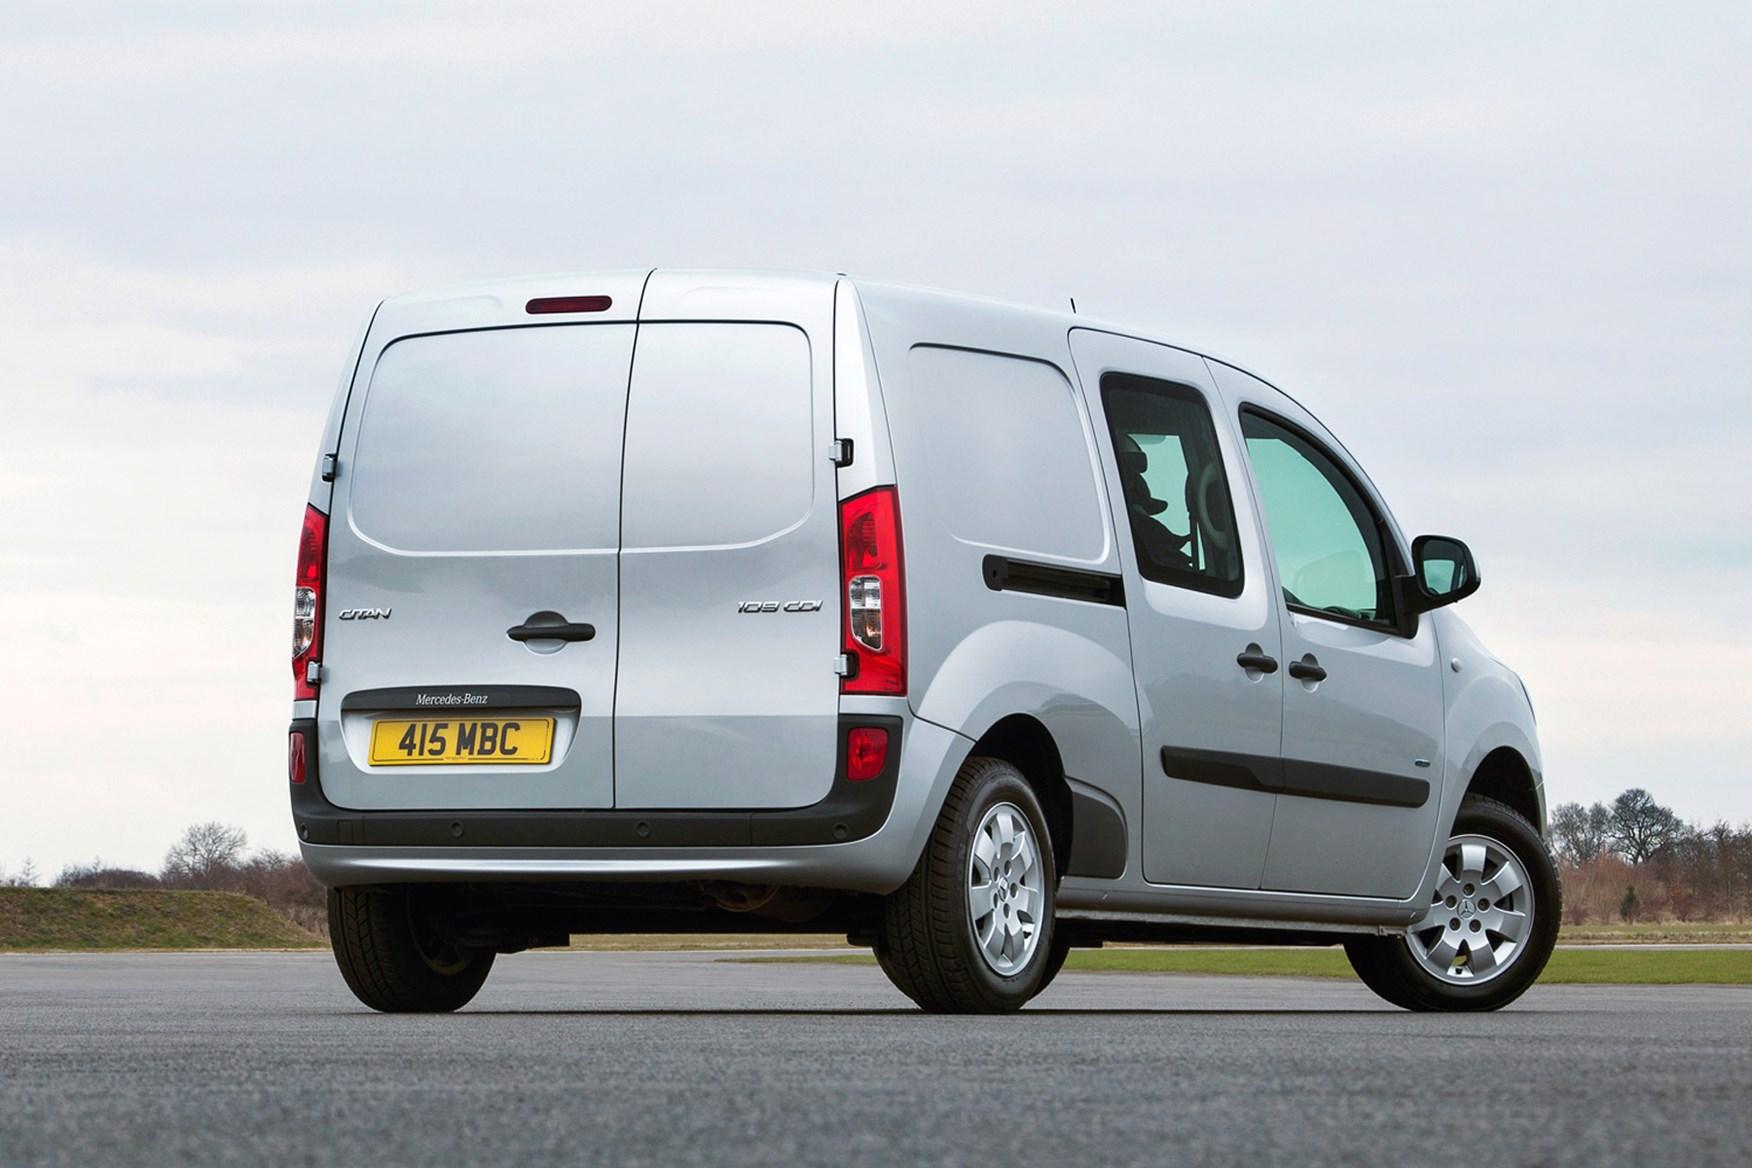 Mercedes-Benz Citan full review on Parkers Vans - rear exterior